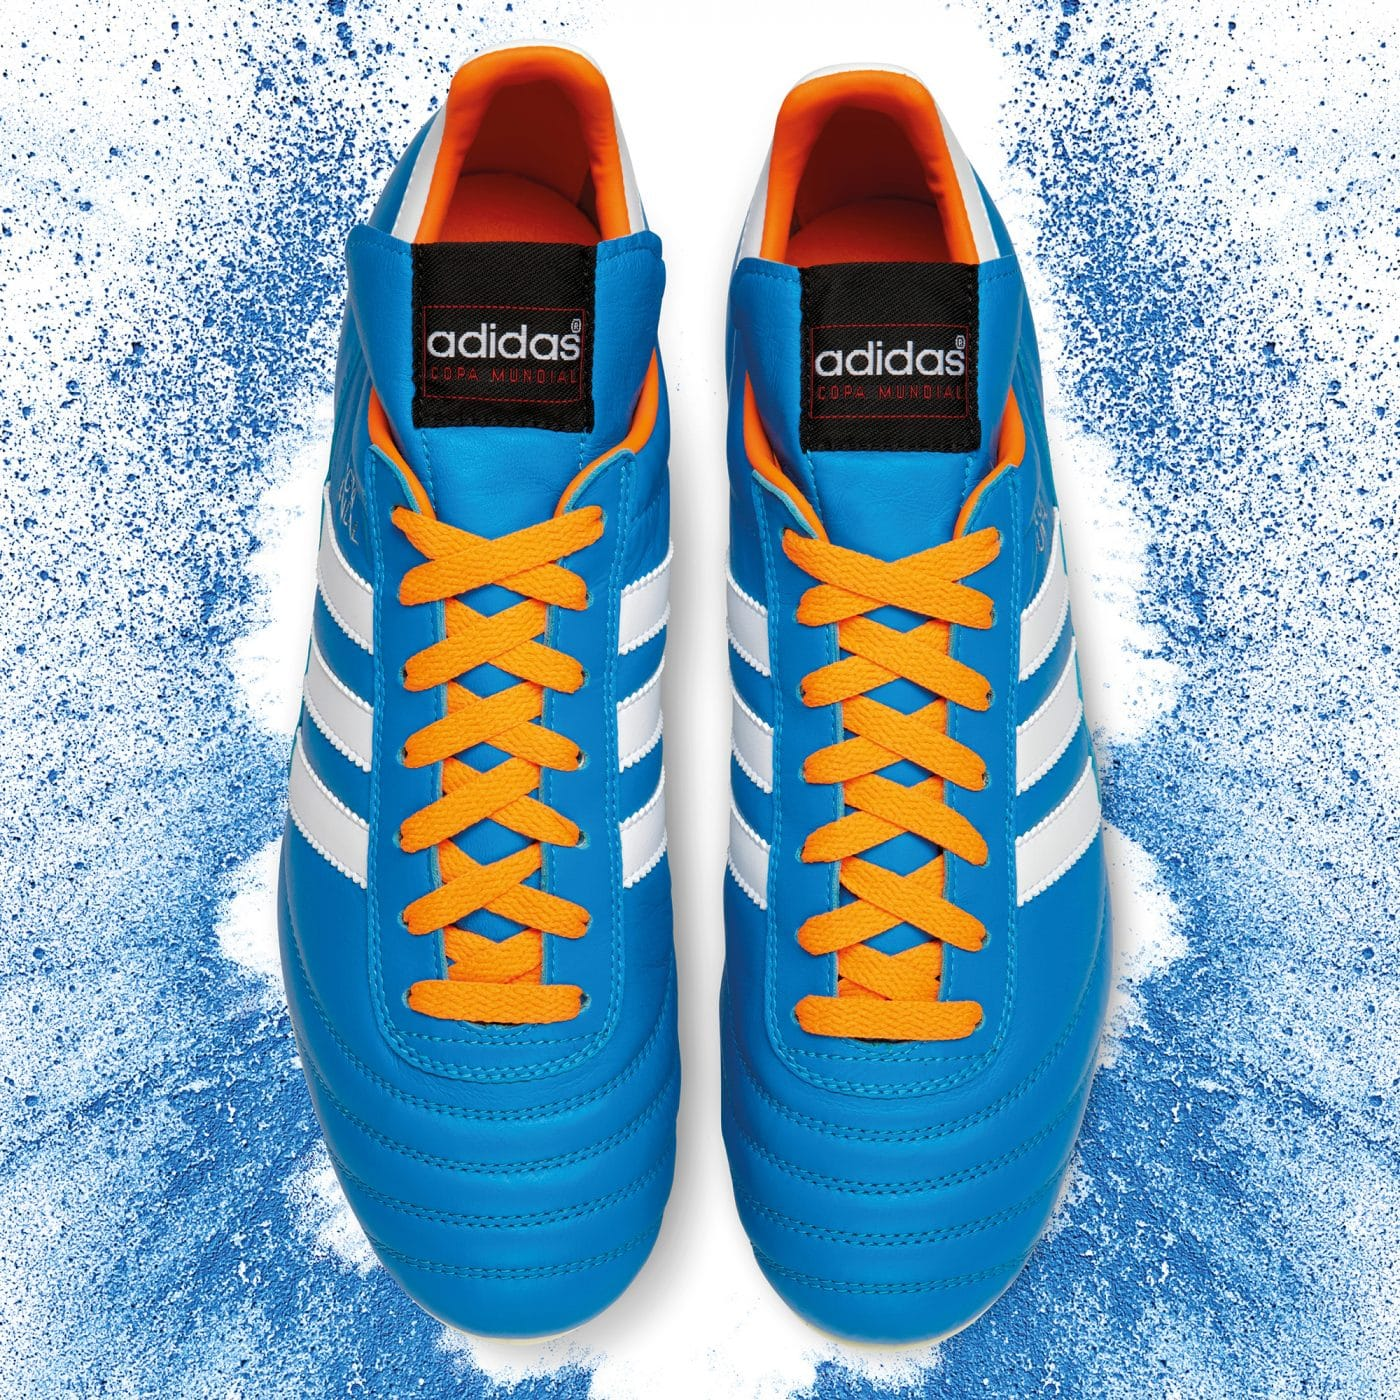 adidas-copa-mundial-samba-pack-bleu